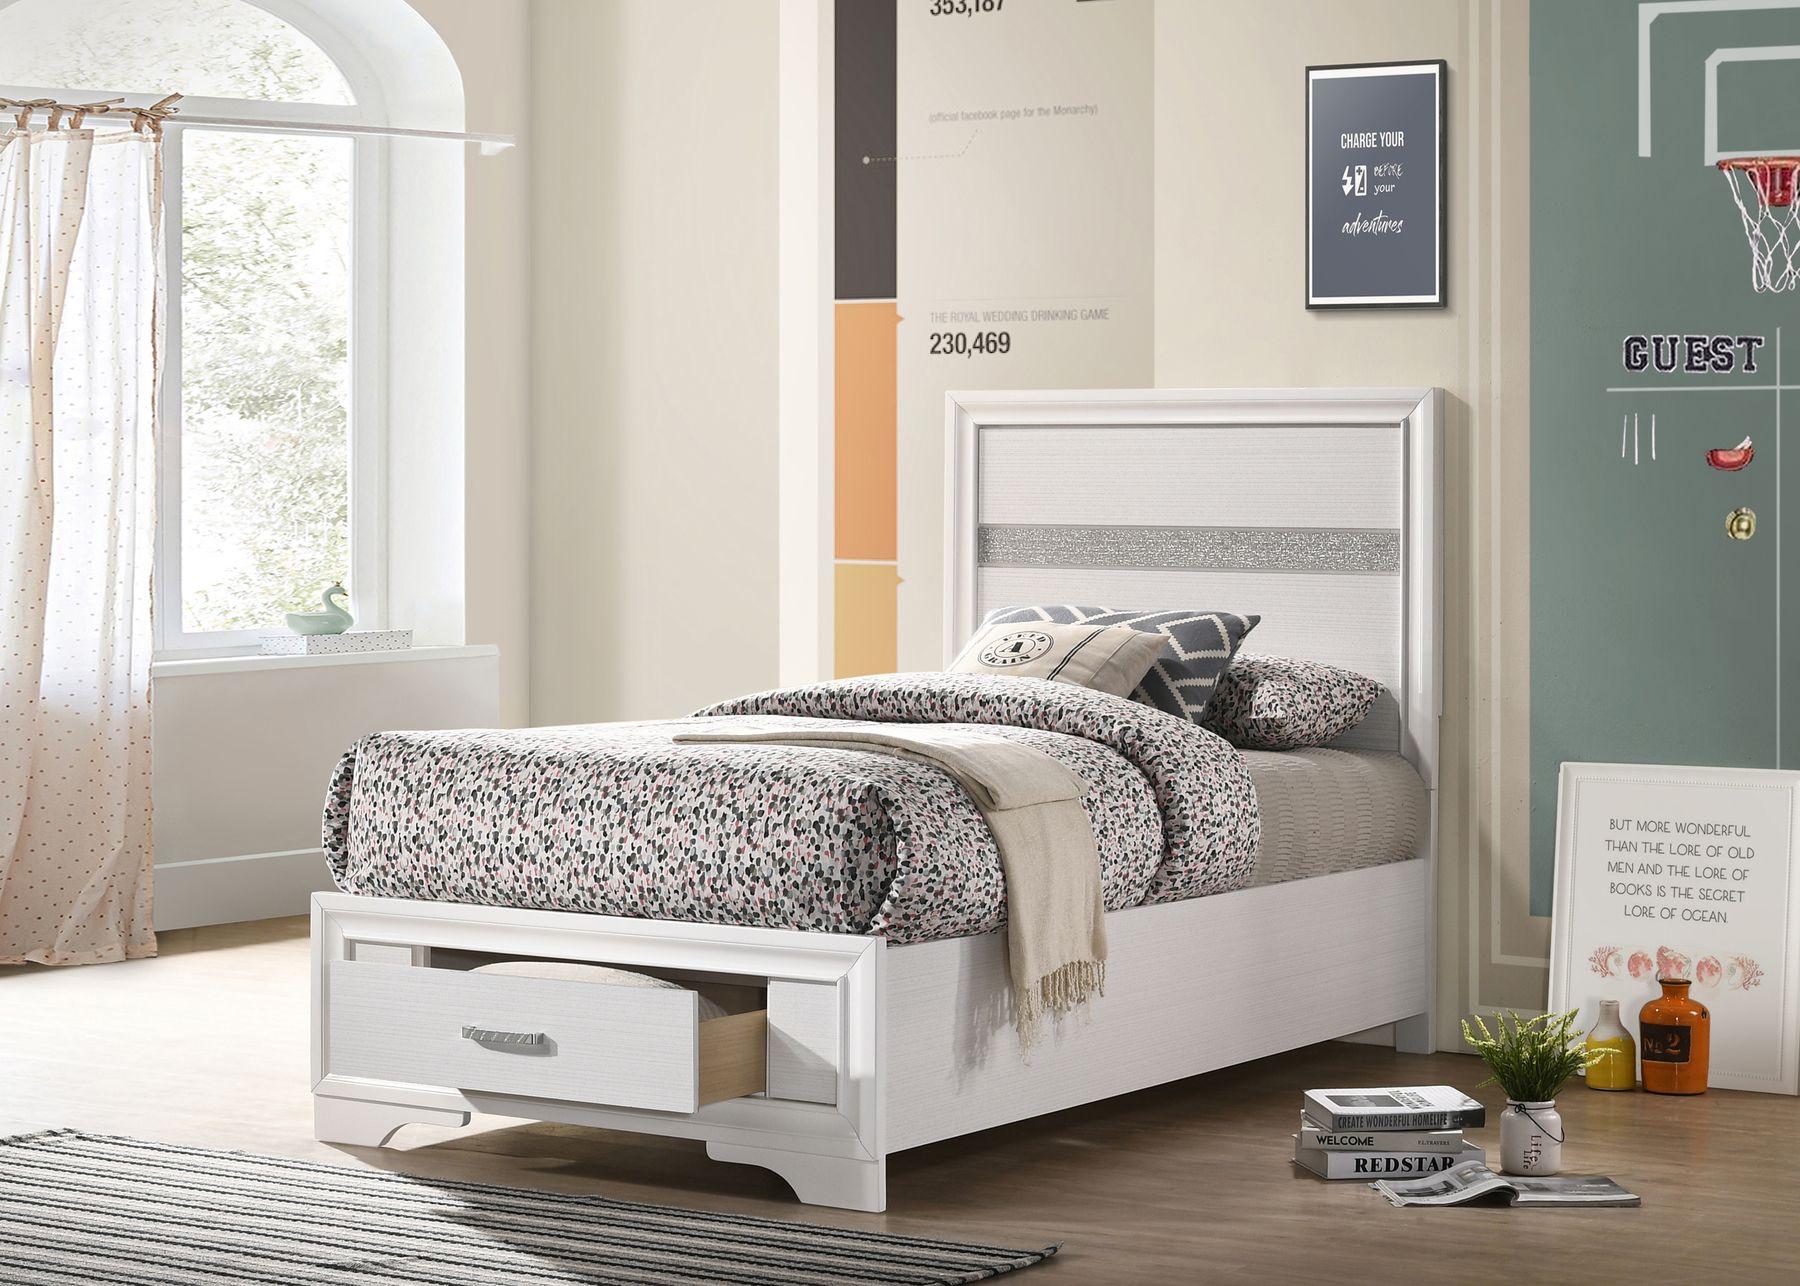 Image result for miranda storage bed coaster twin